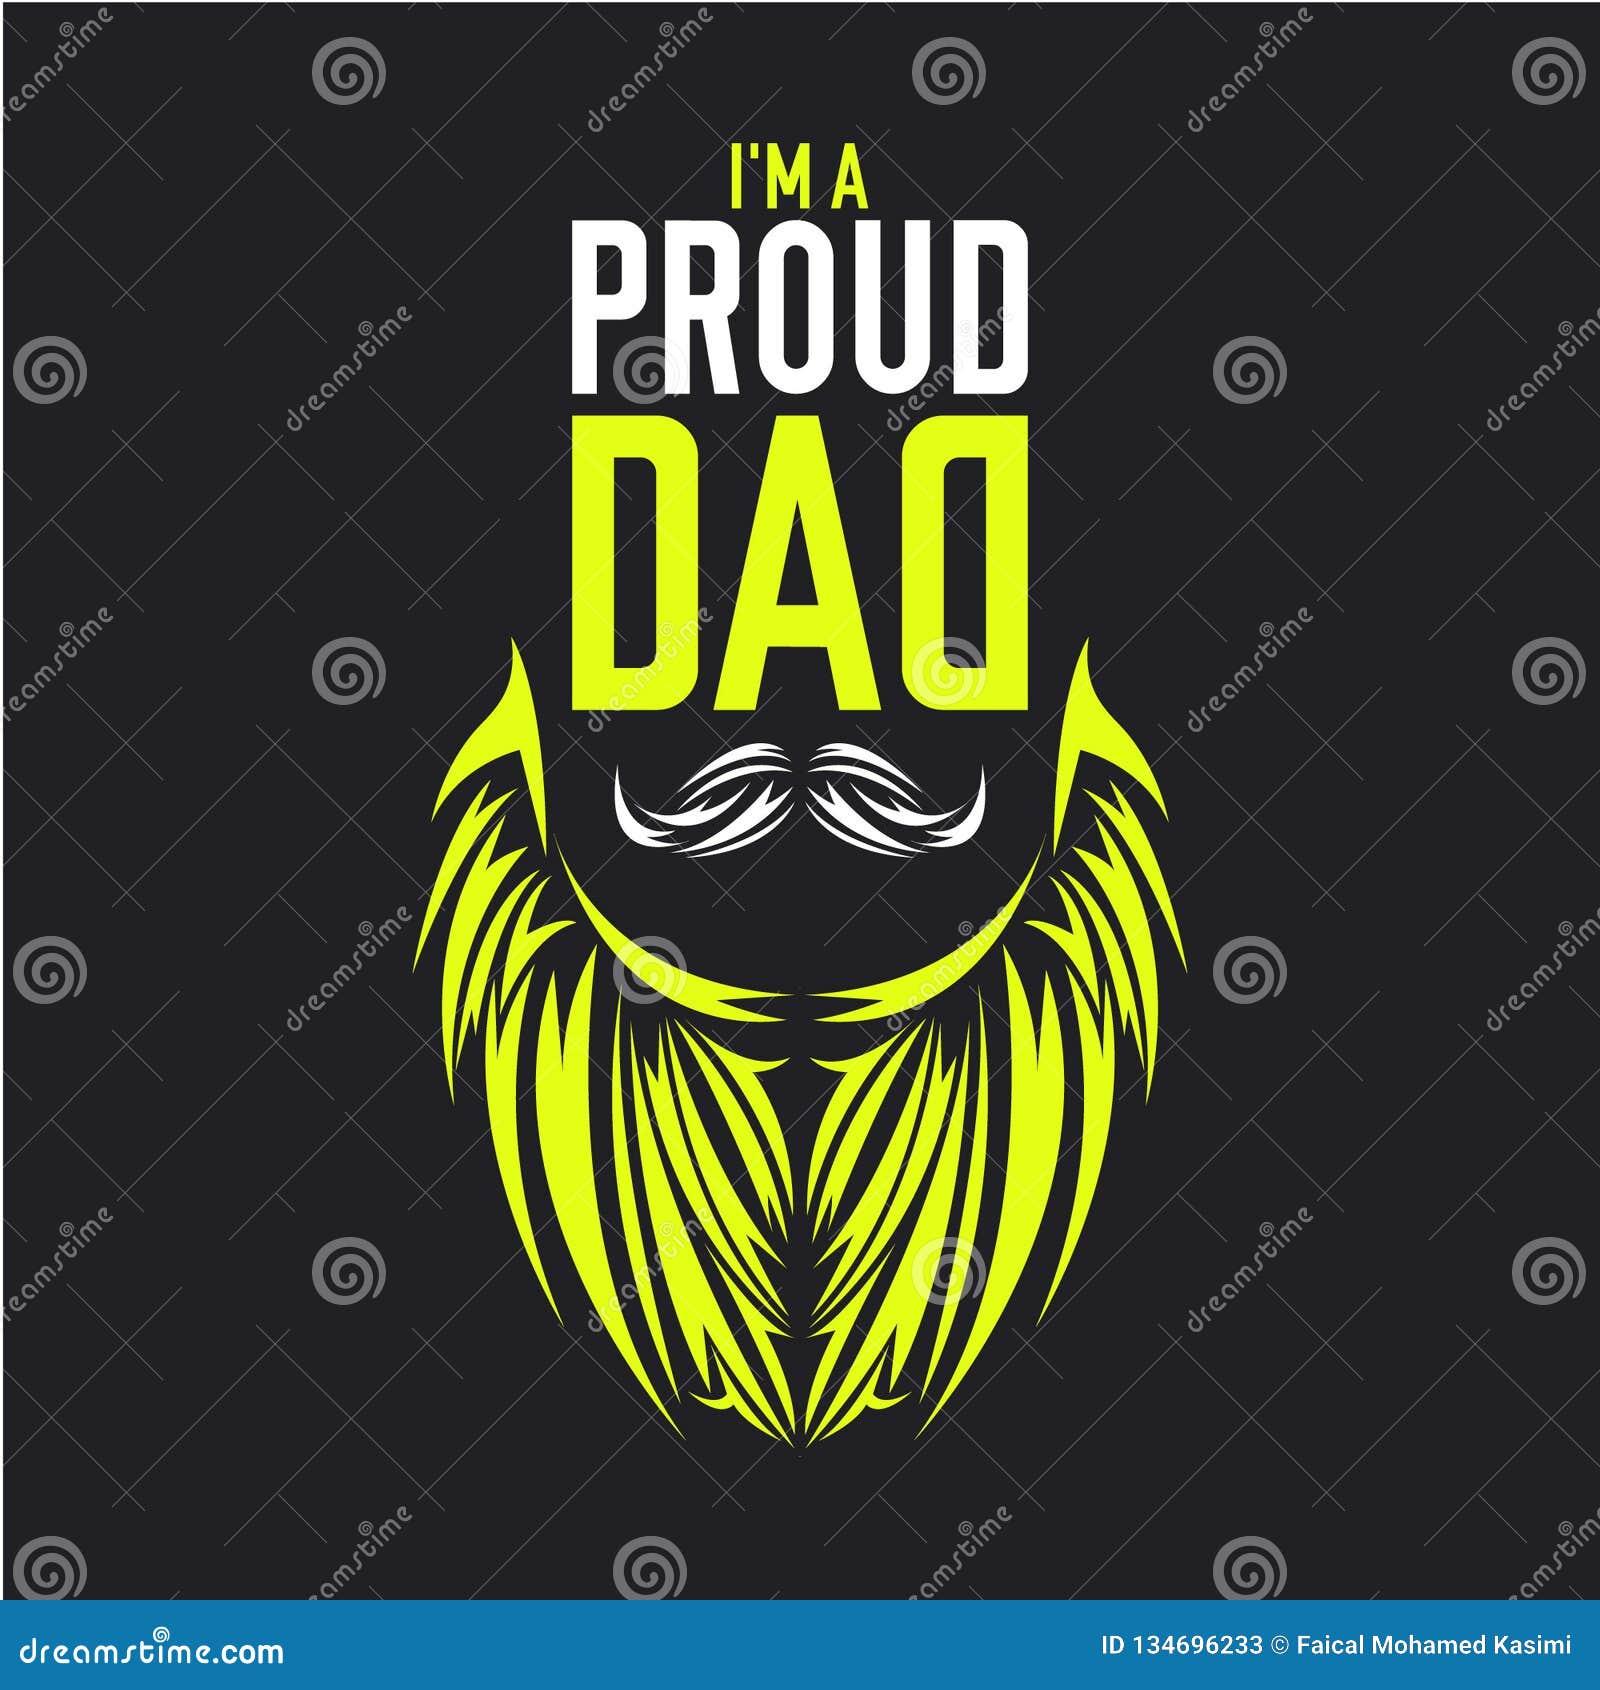 Am proud dad illustration shirt design